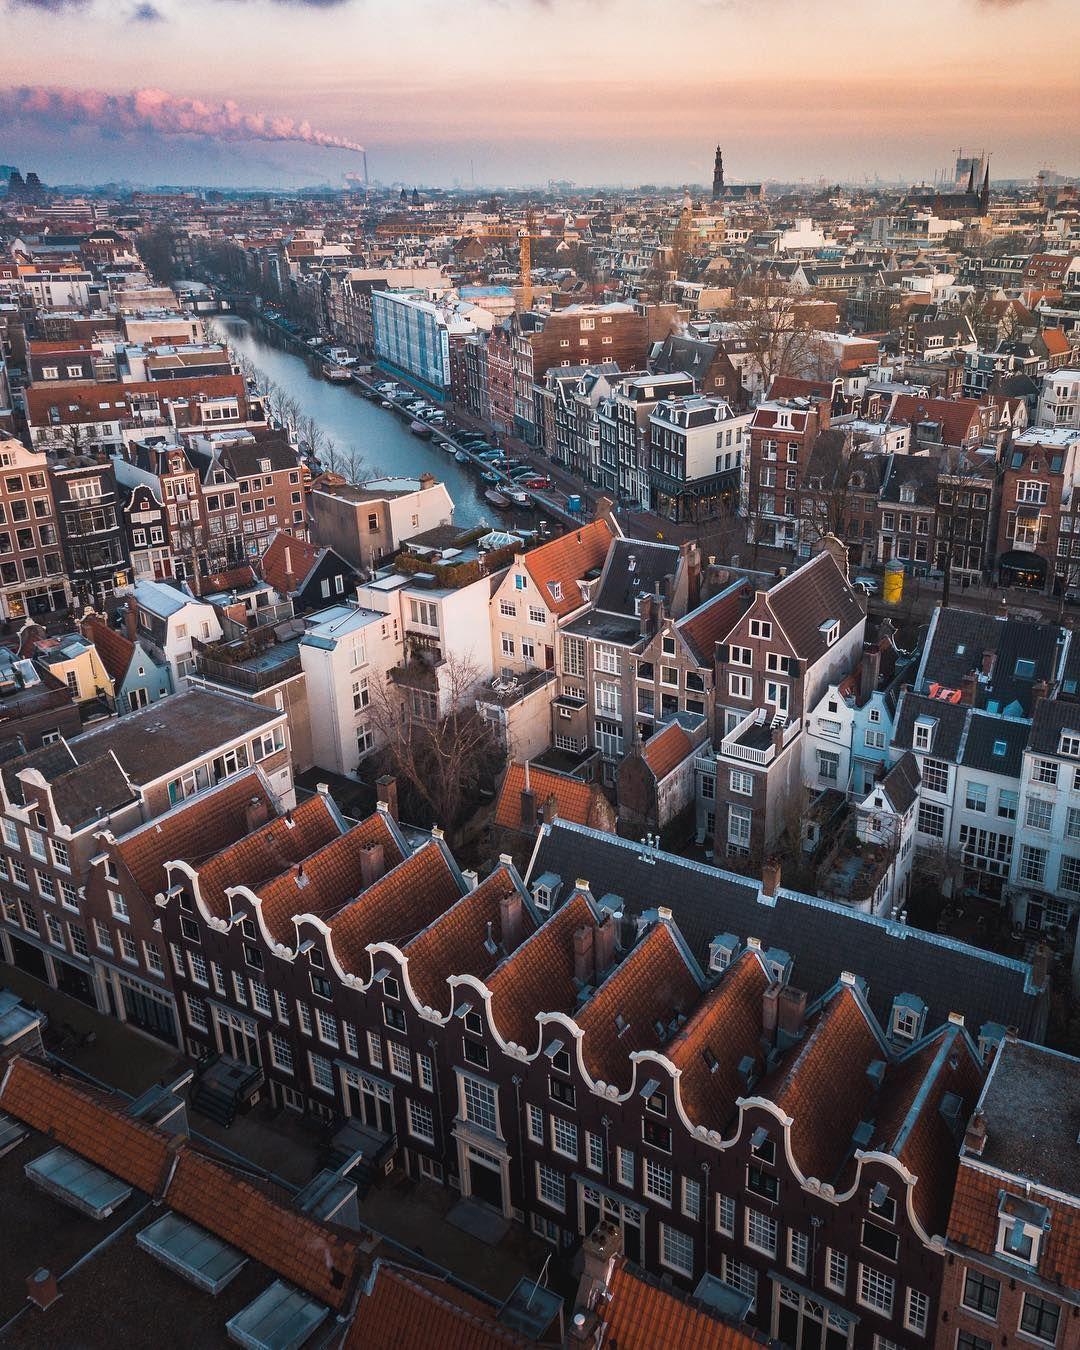 Plaatsen Rond Amsterdam.Bas Van Breuker Iamthebas On Instagram I M Back Baby Amsterdam